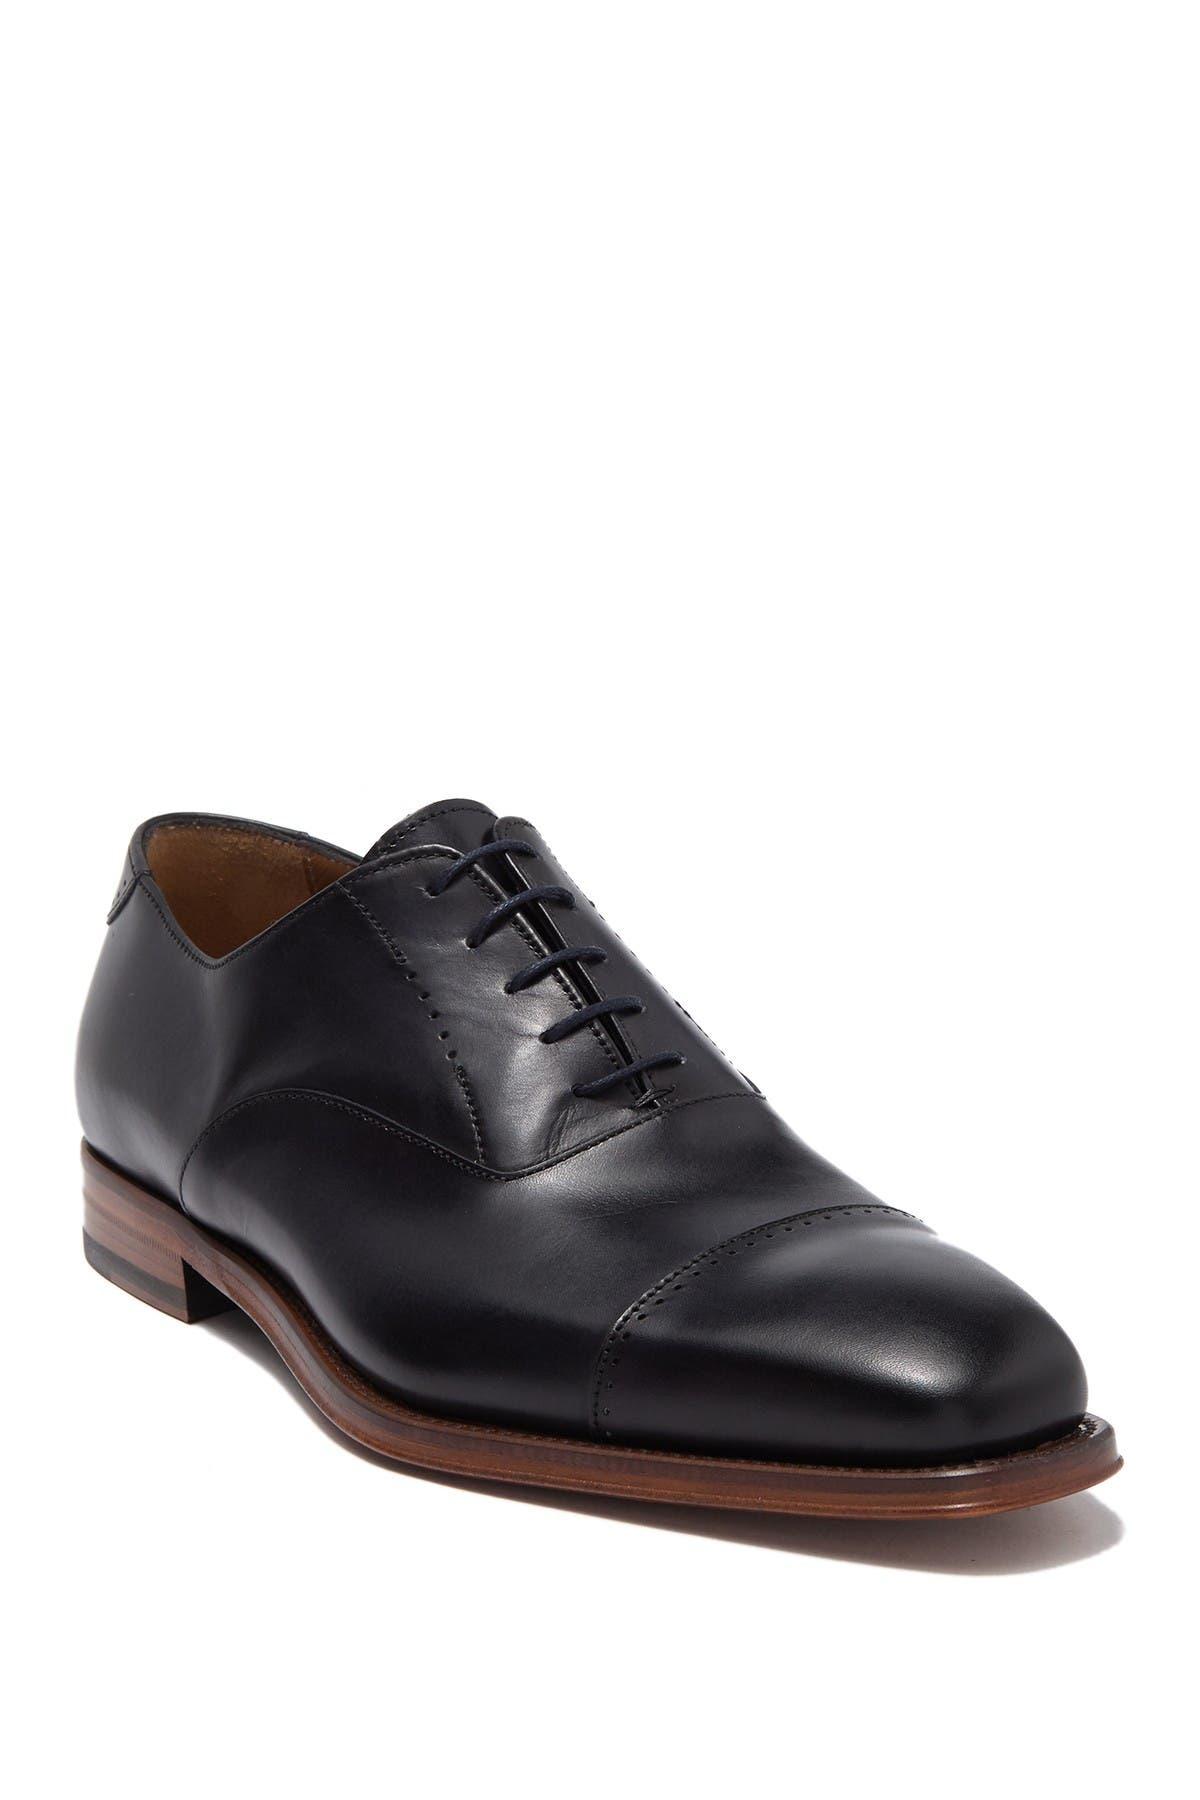 Image of Antonio Maurizi Leather Cap Toe Oxford